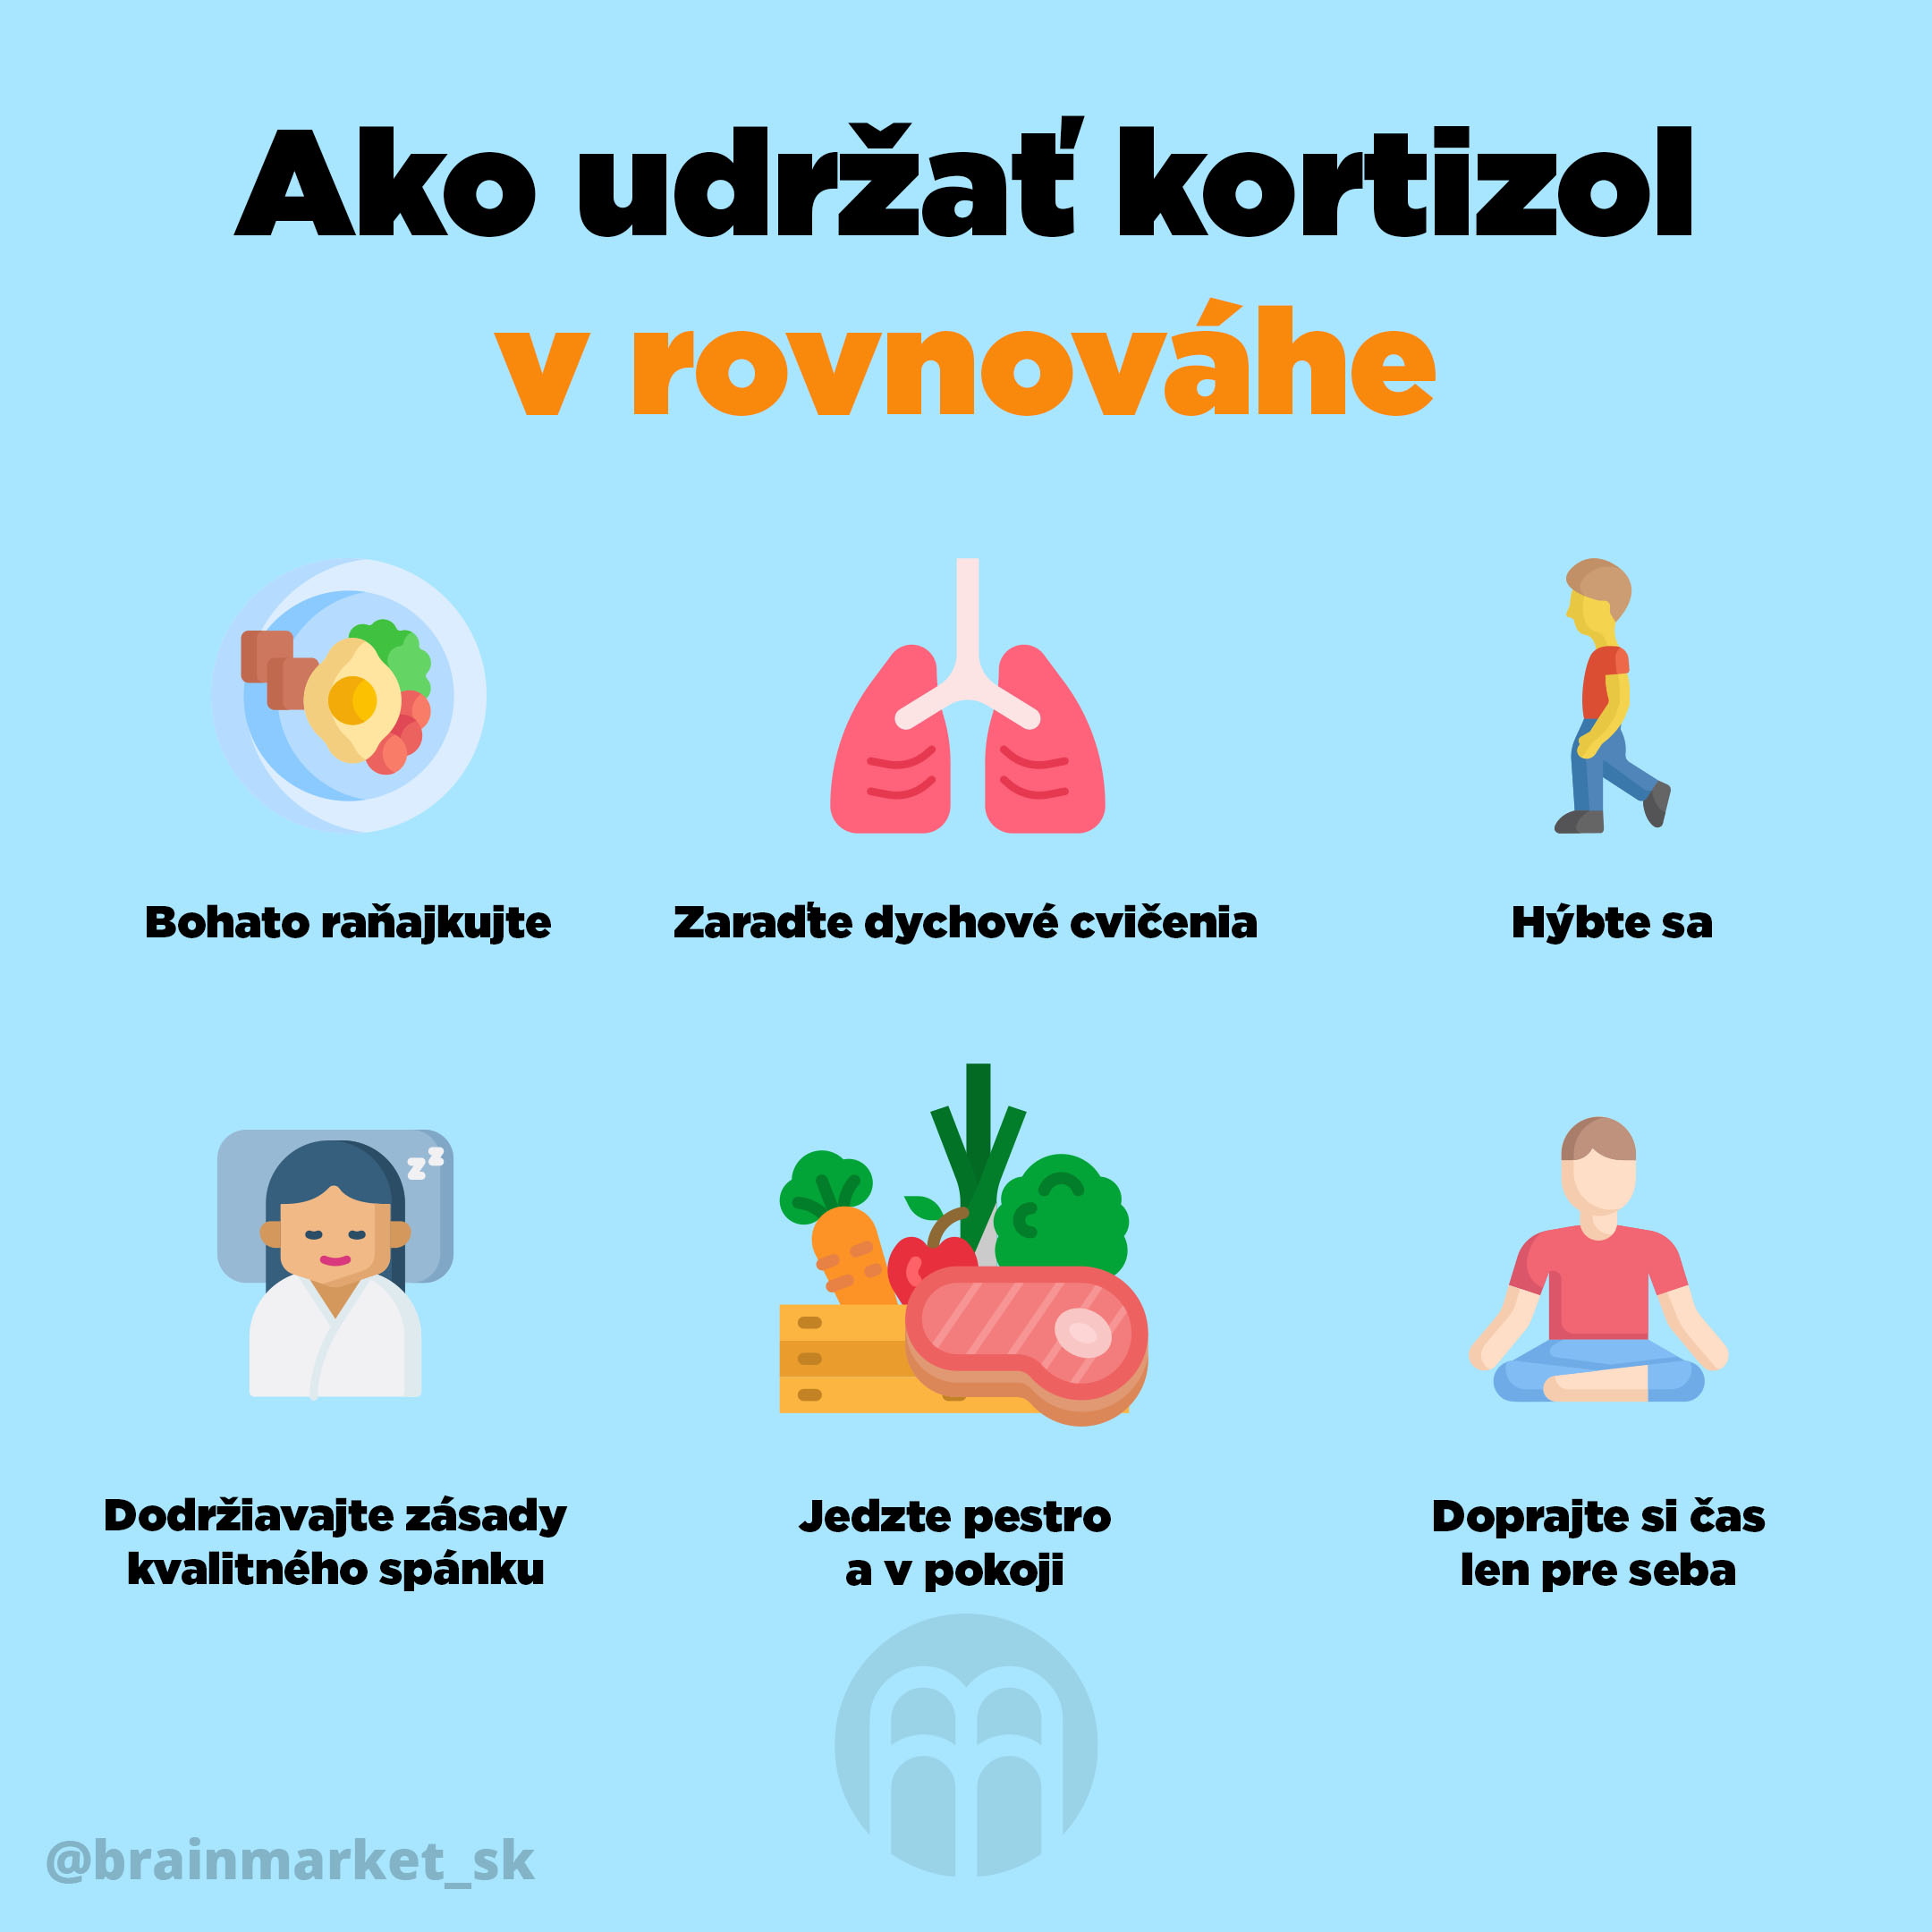 ako_udrzat_kortizol_v_rovnovahe_SK_ifnografika_brainmarket_SK